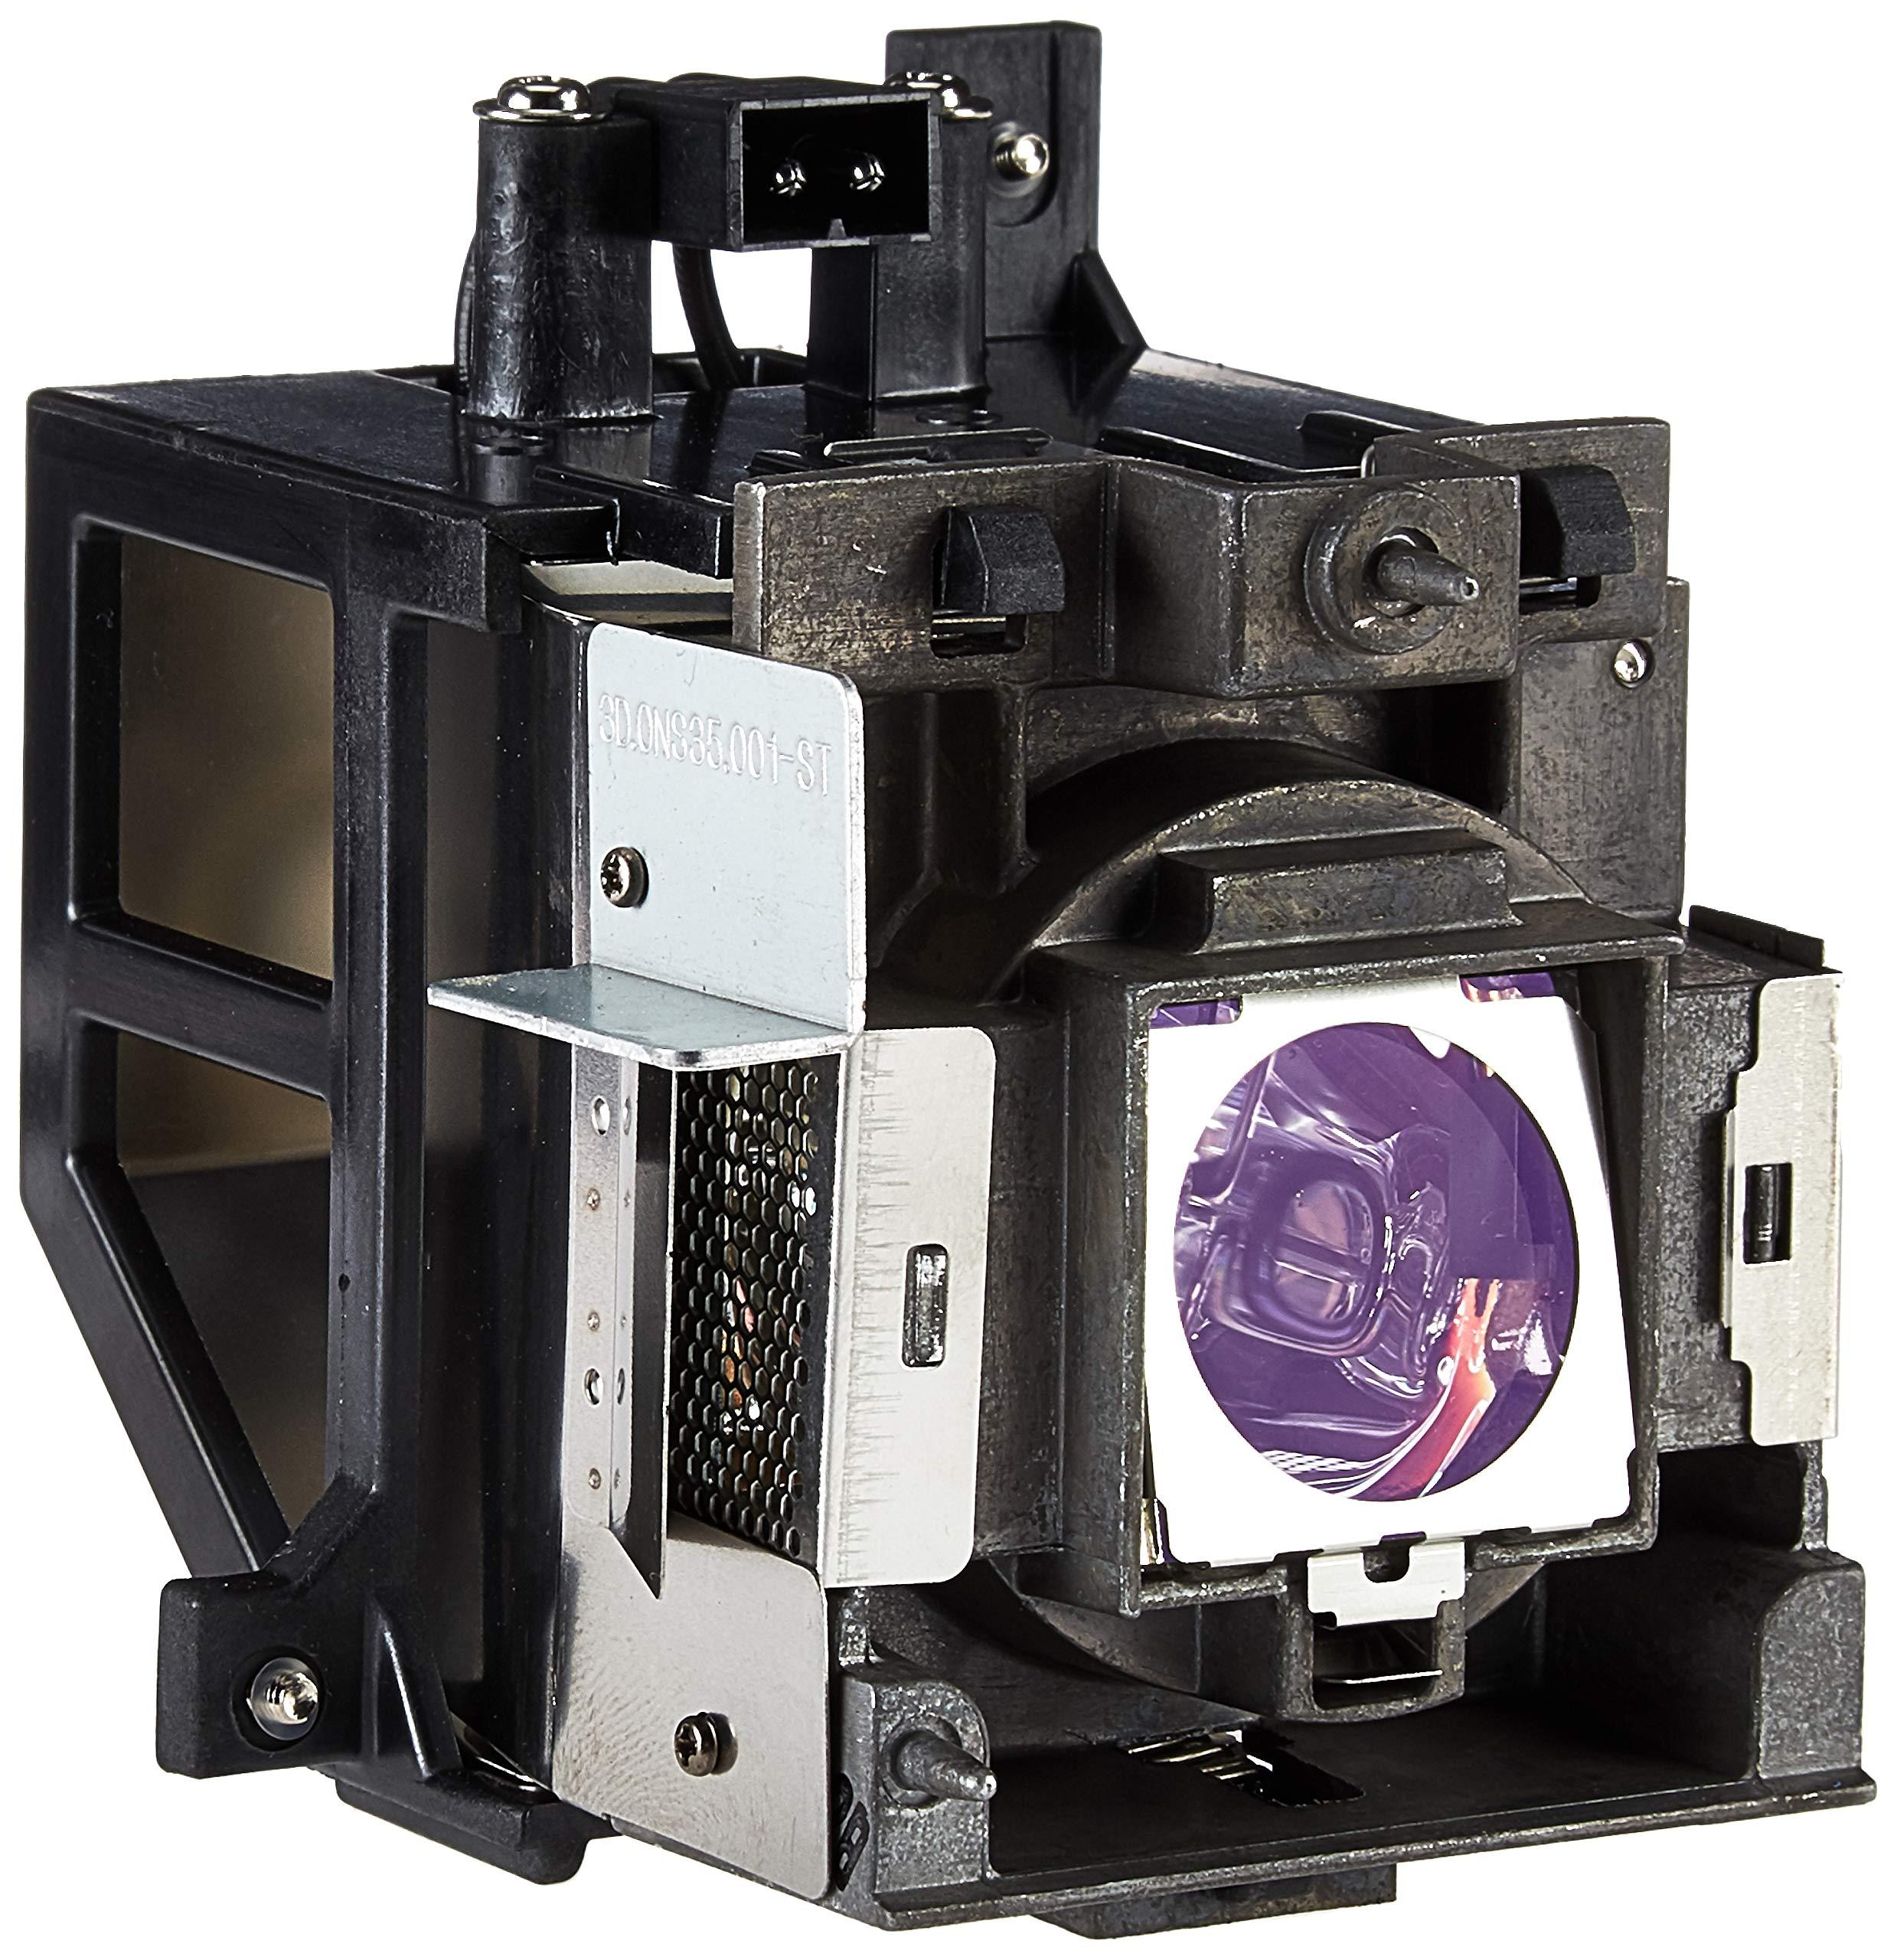 BenQ 5J.J2805.001 Projector Lamp